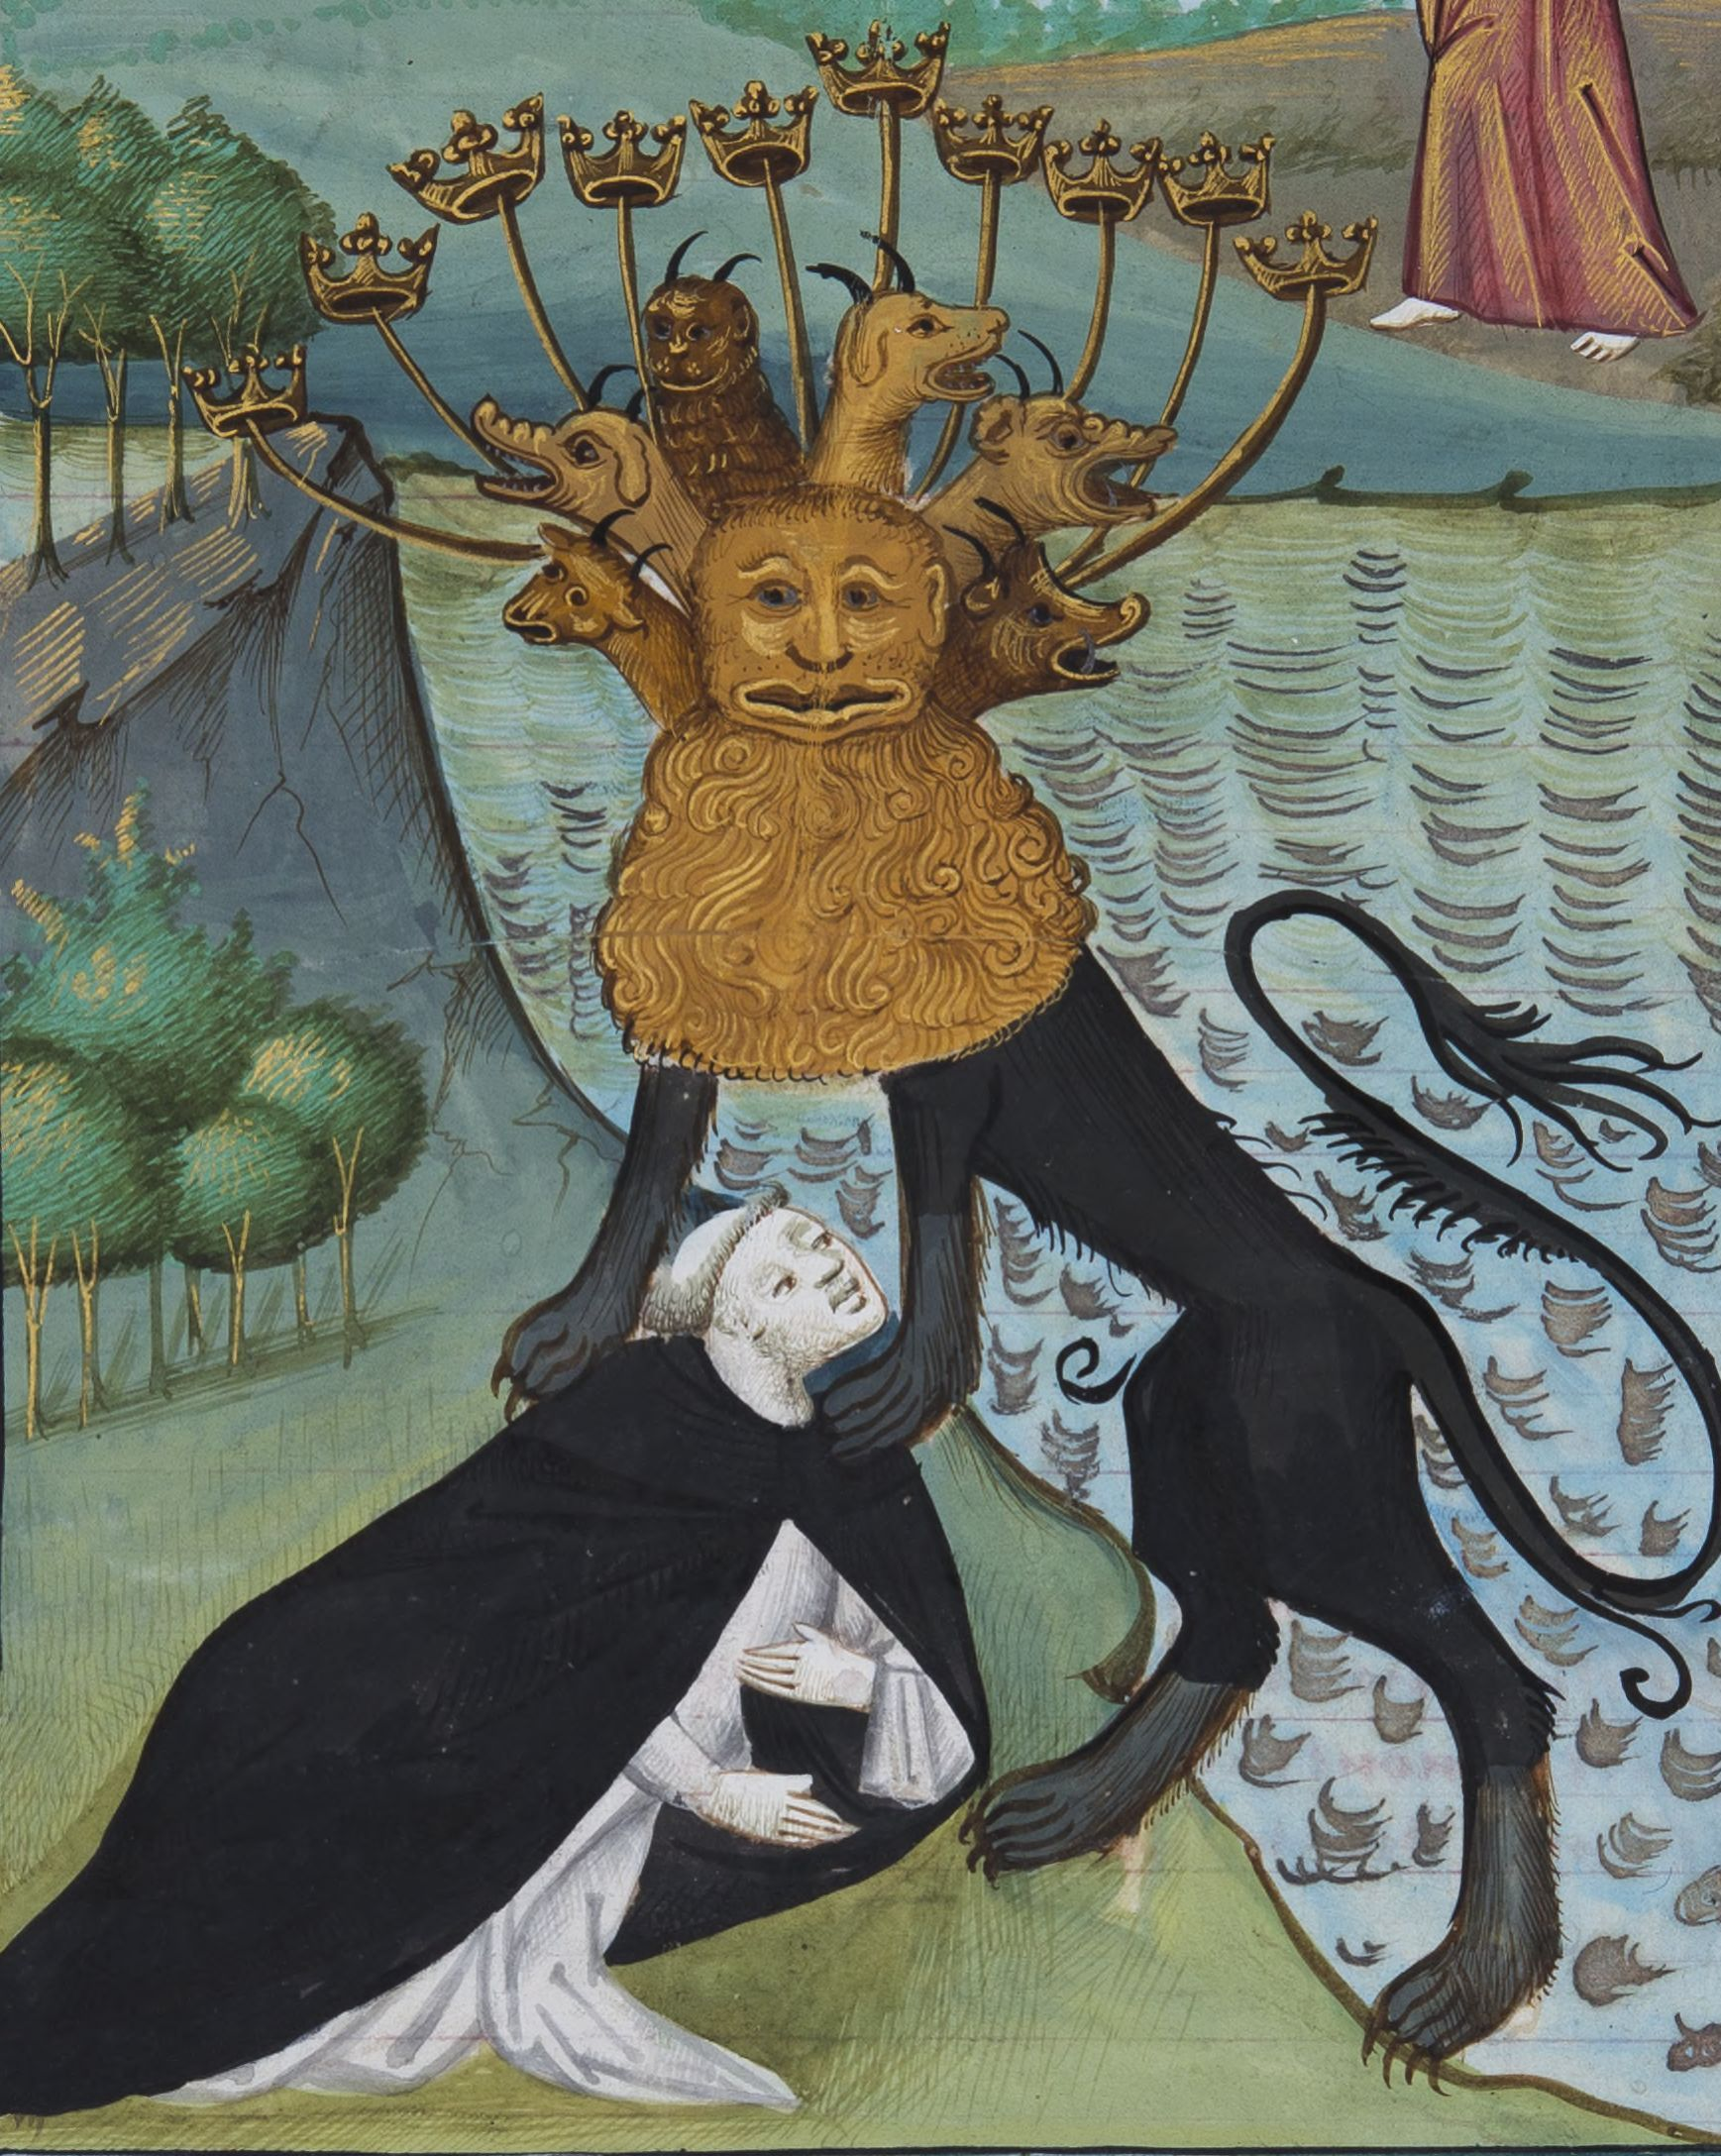 Http Gallica Bnf Fr Ark 12148 Btv1b52506341n F28 Item R Miniature Zoom Medieval Artwork Medieval Art Literature Art